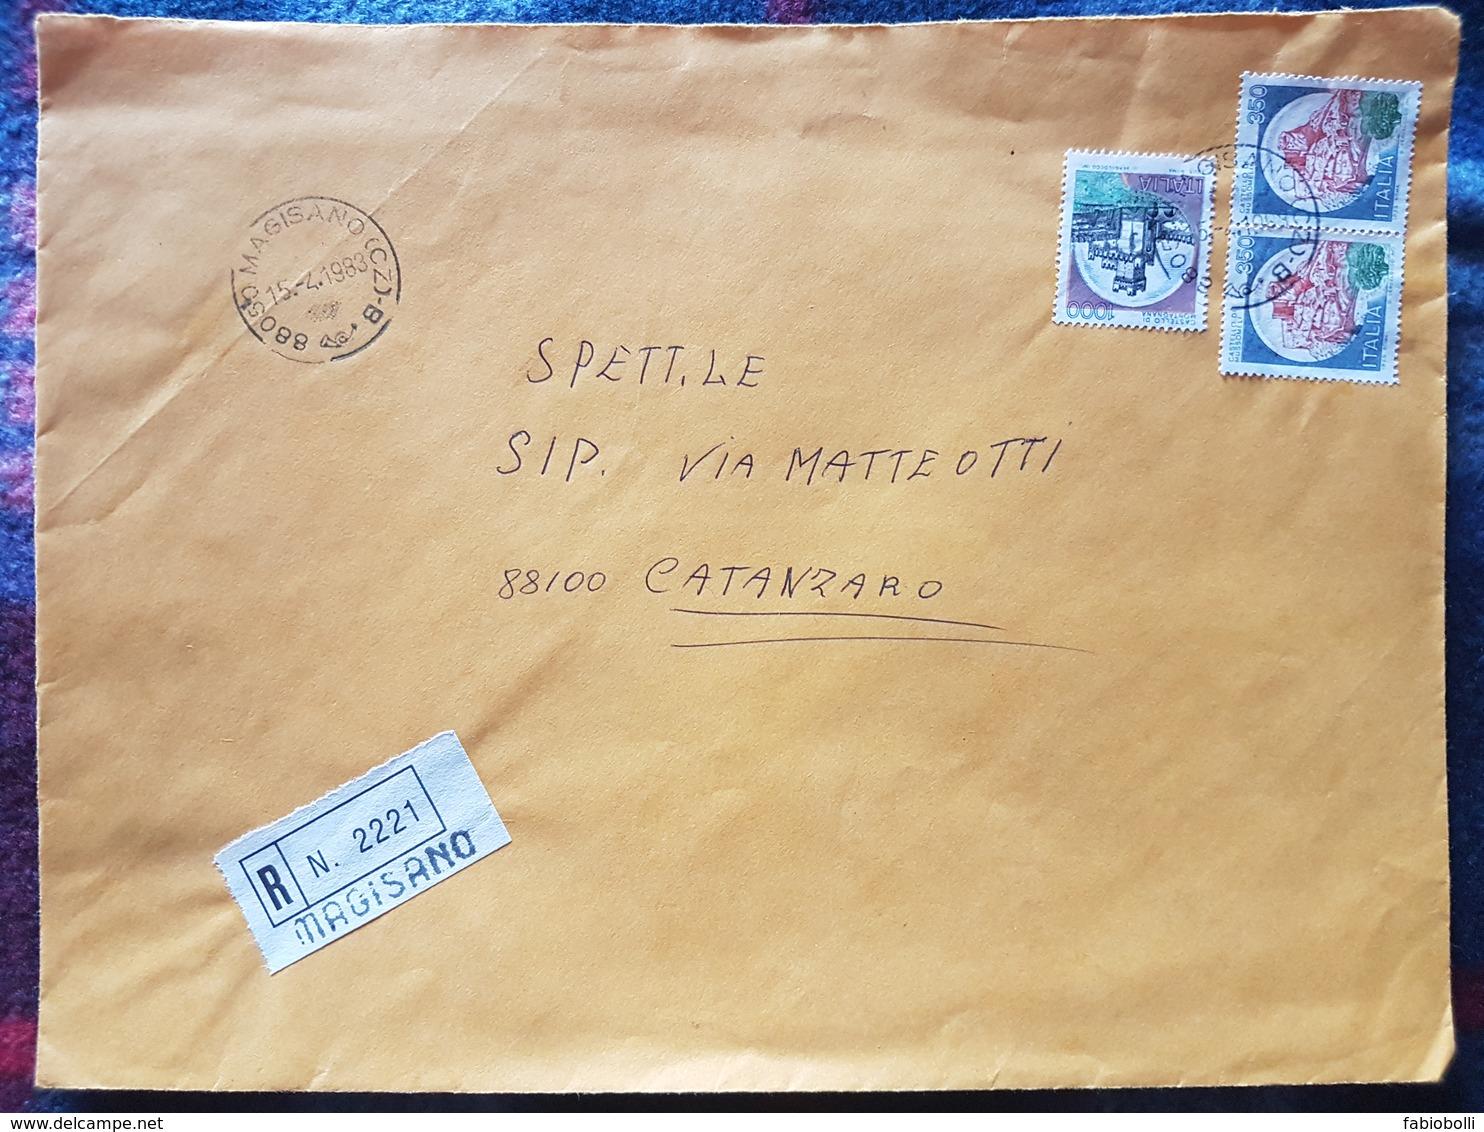 (17926) STORIA POSTALE ITALIA 1983 - 1981-90: Storia Postale